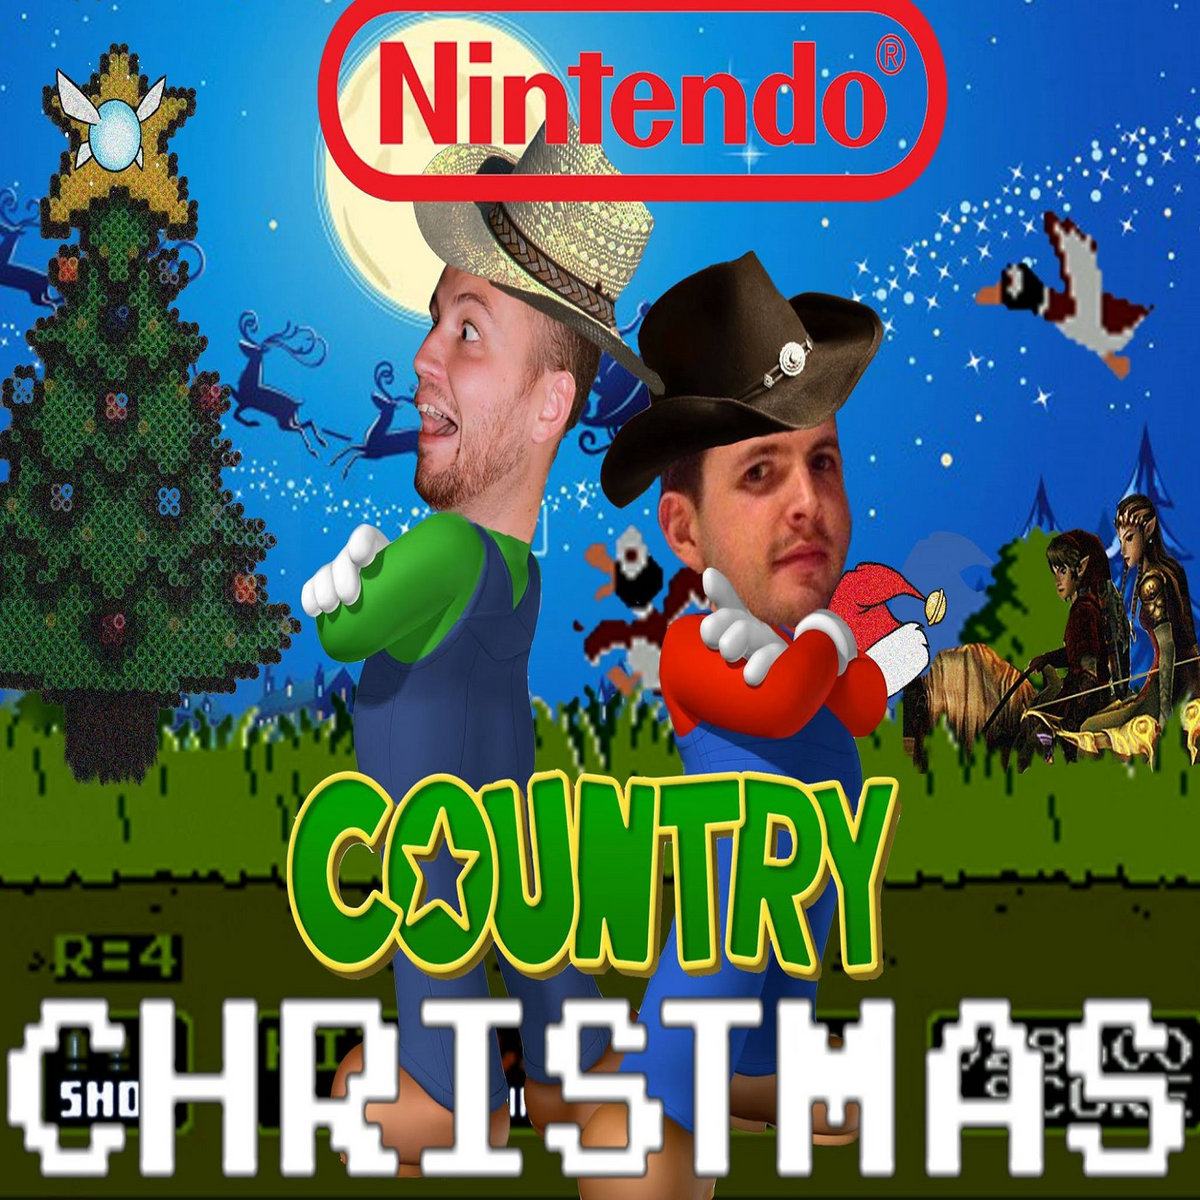 Nintendo Country Christmas   2 Dudes and a NES